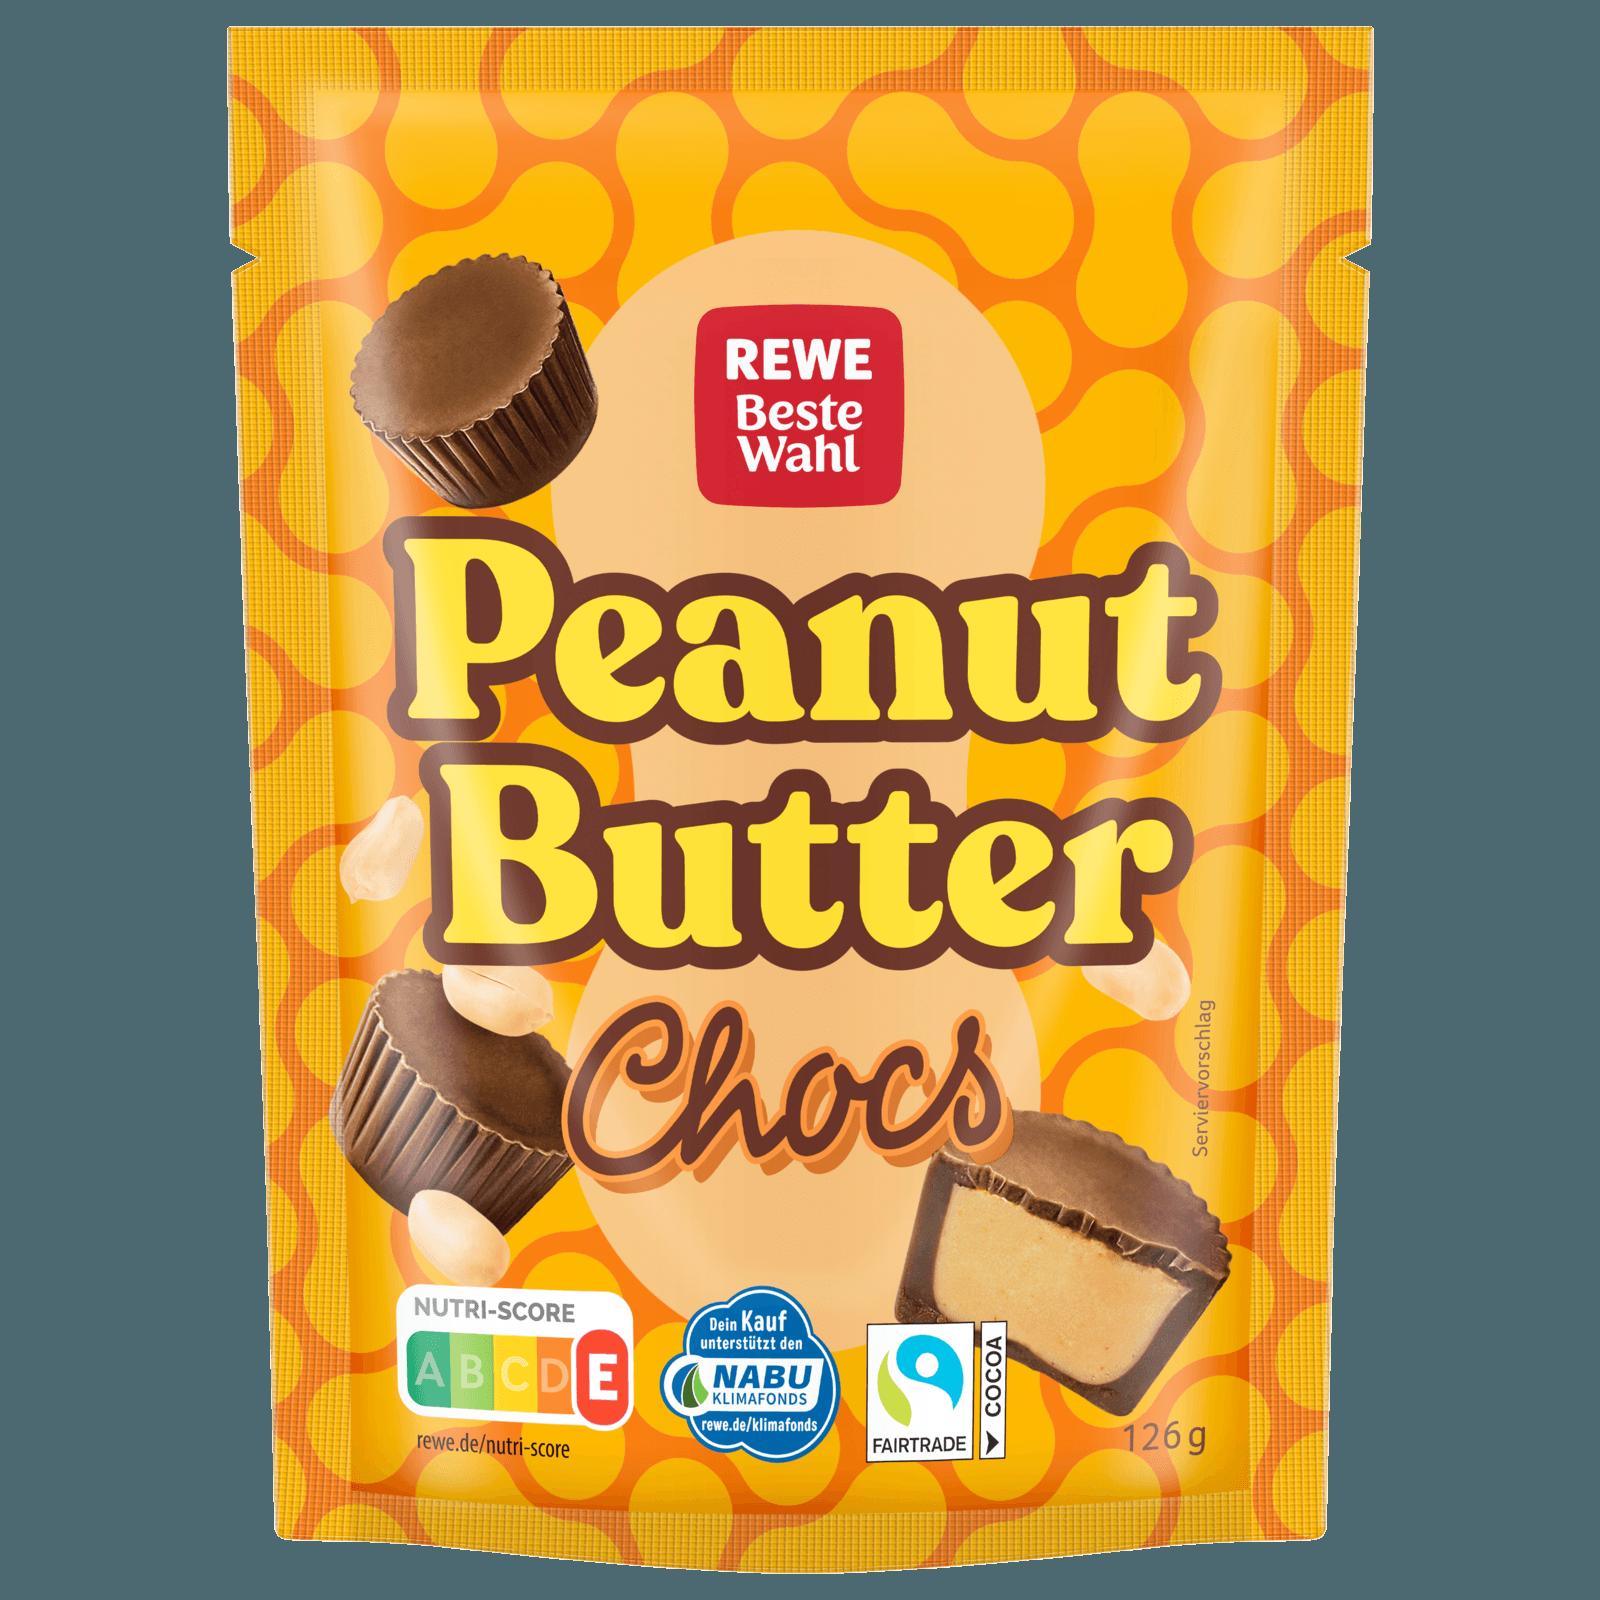 REWE Beste Wahl Peanut Butter Chocs 20g bei REWE online bestellen